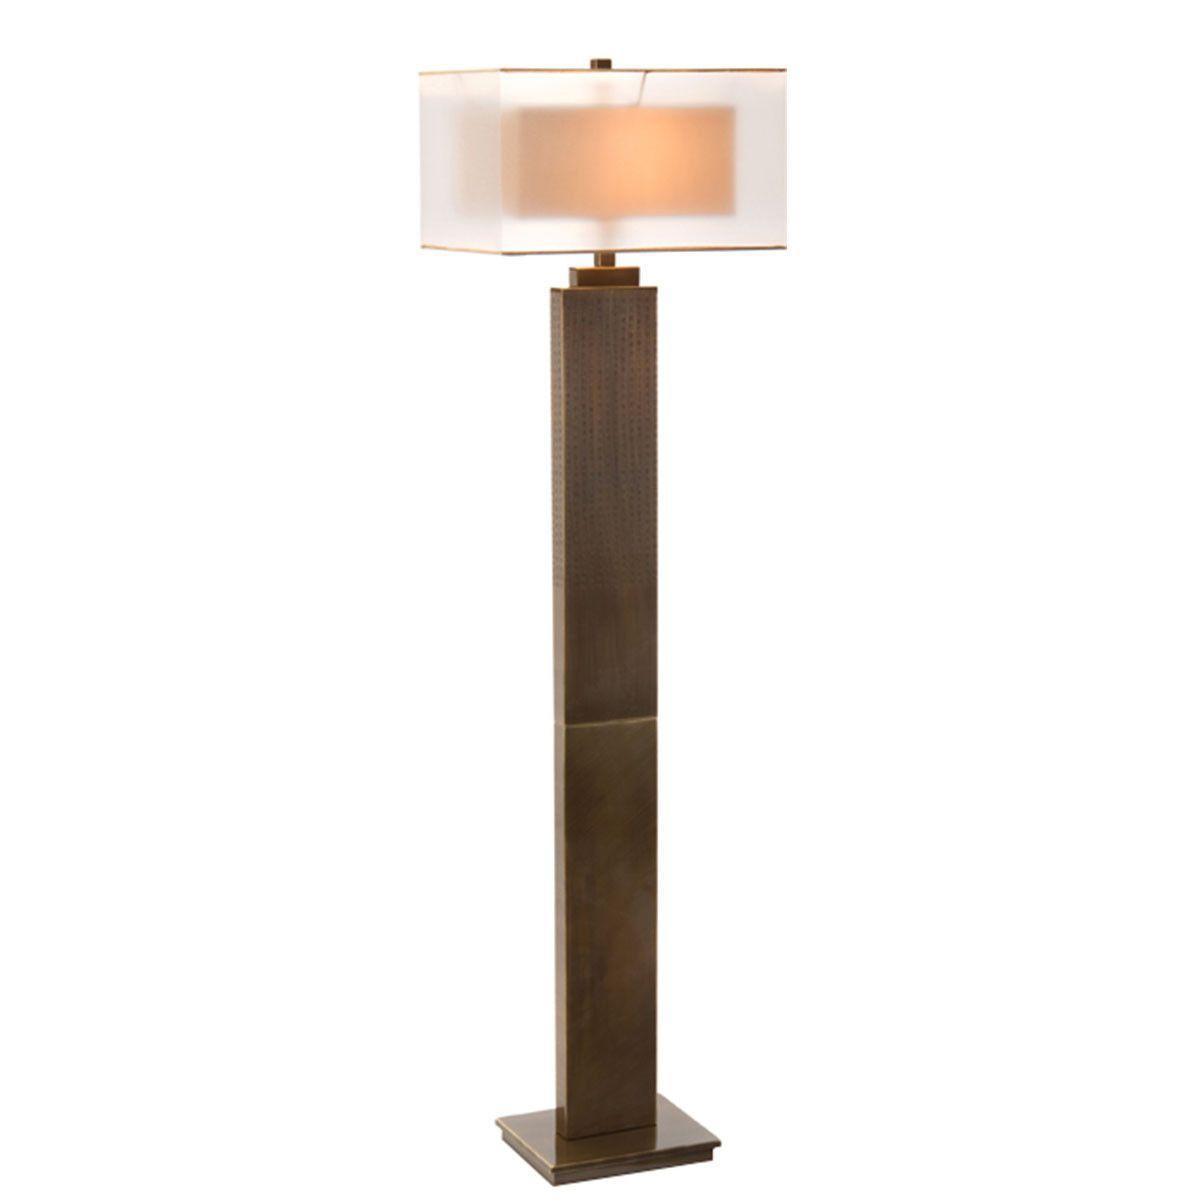 John Richard Zen Floor Lamp | Shop now on Pinterest! | Pinterest ...